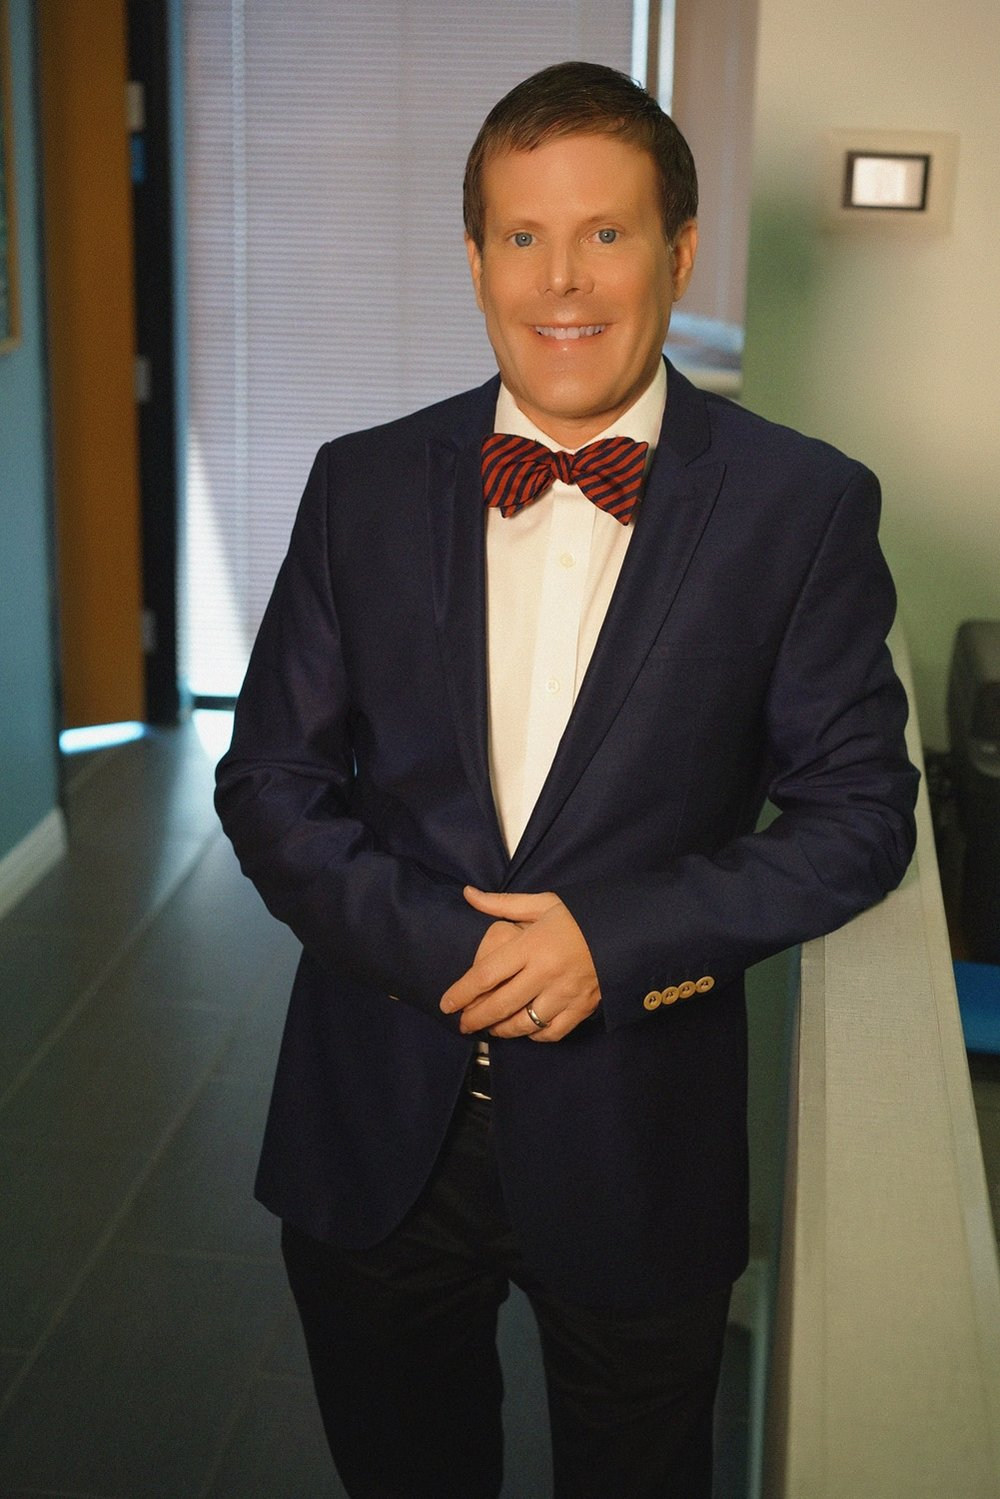 JOHN SCHOLZ  OPERATIONS MANAGER, CFO